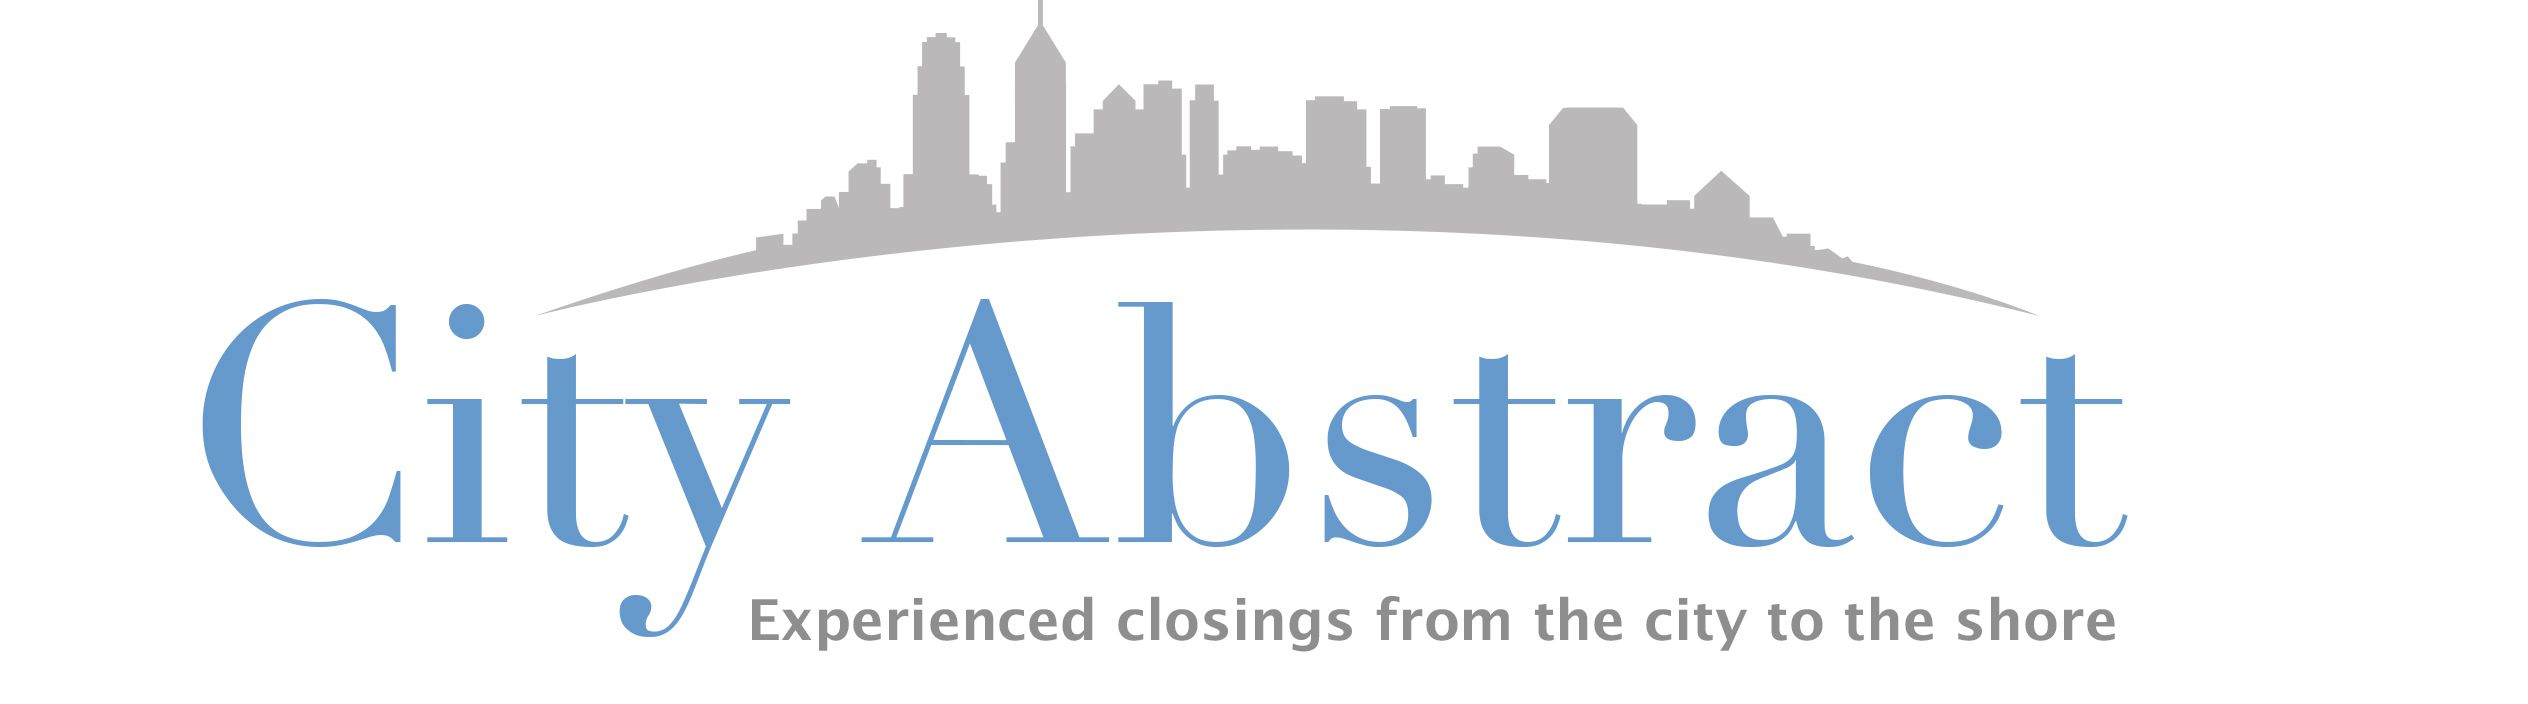 CityAbstract_Logo v2